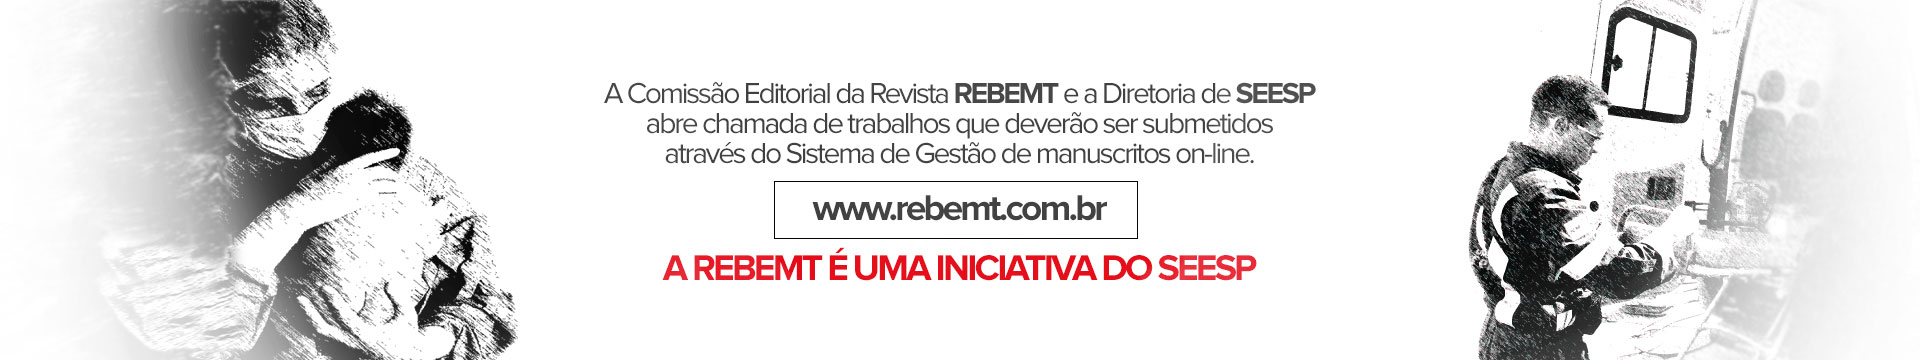 REBEMT